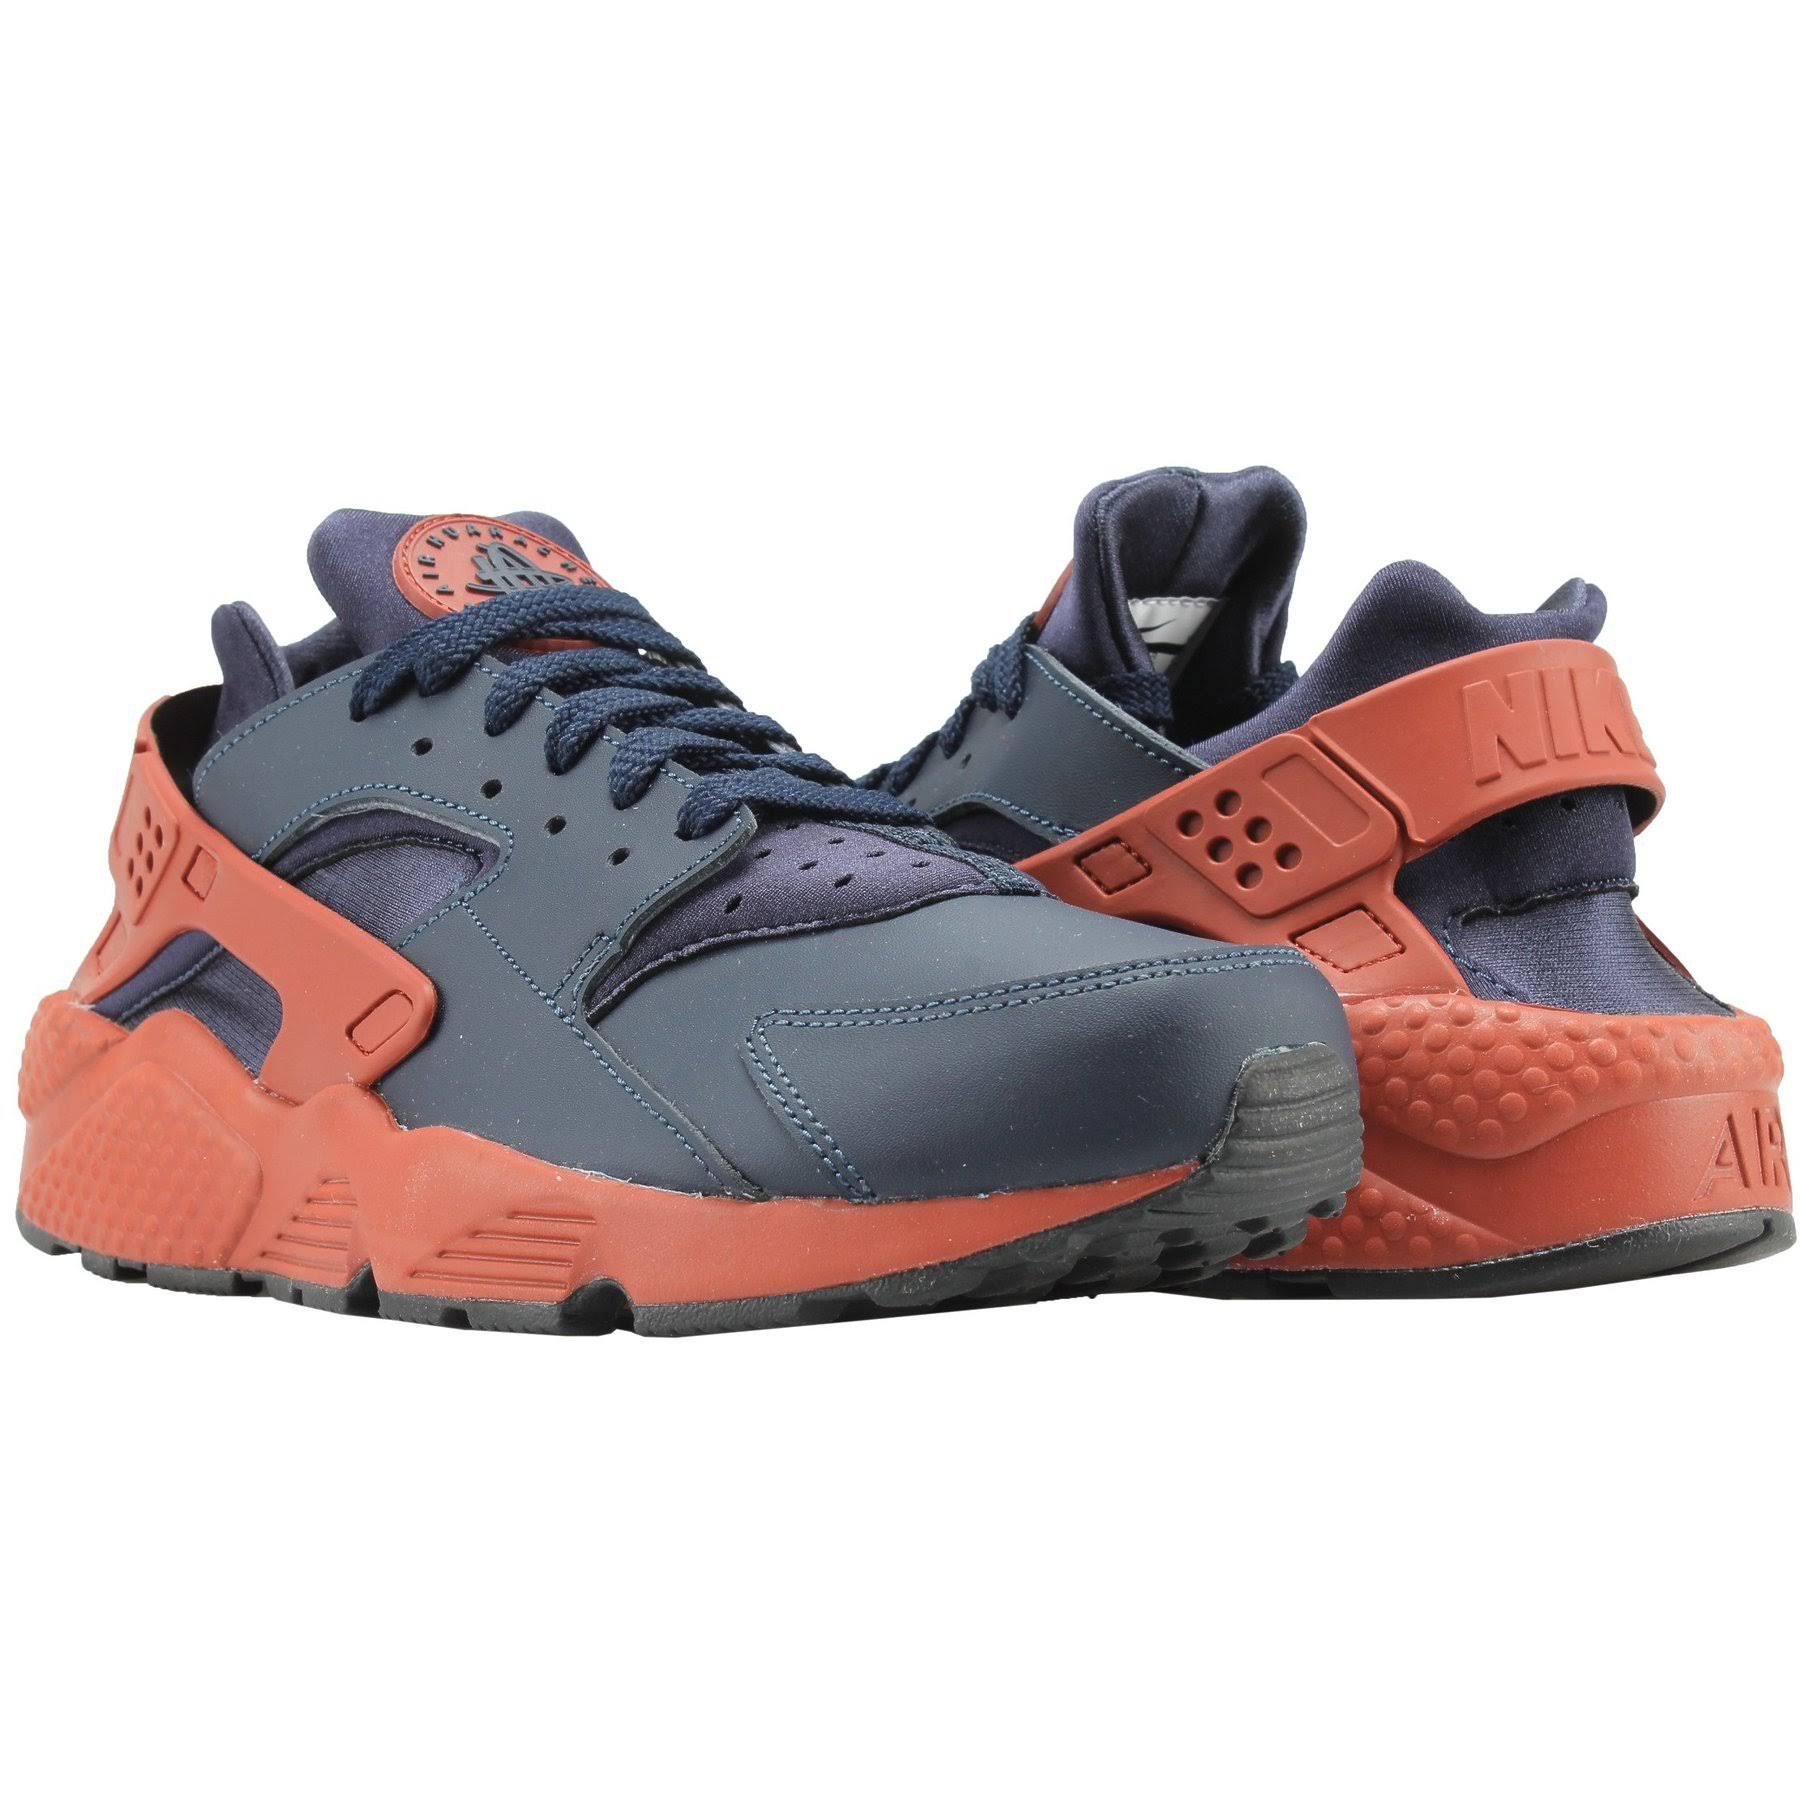 Huarache 11 Tamaño Nike Para Air Hombre 5 Calzado 318429417 Bx0FqgFY5w